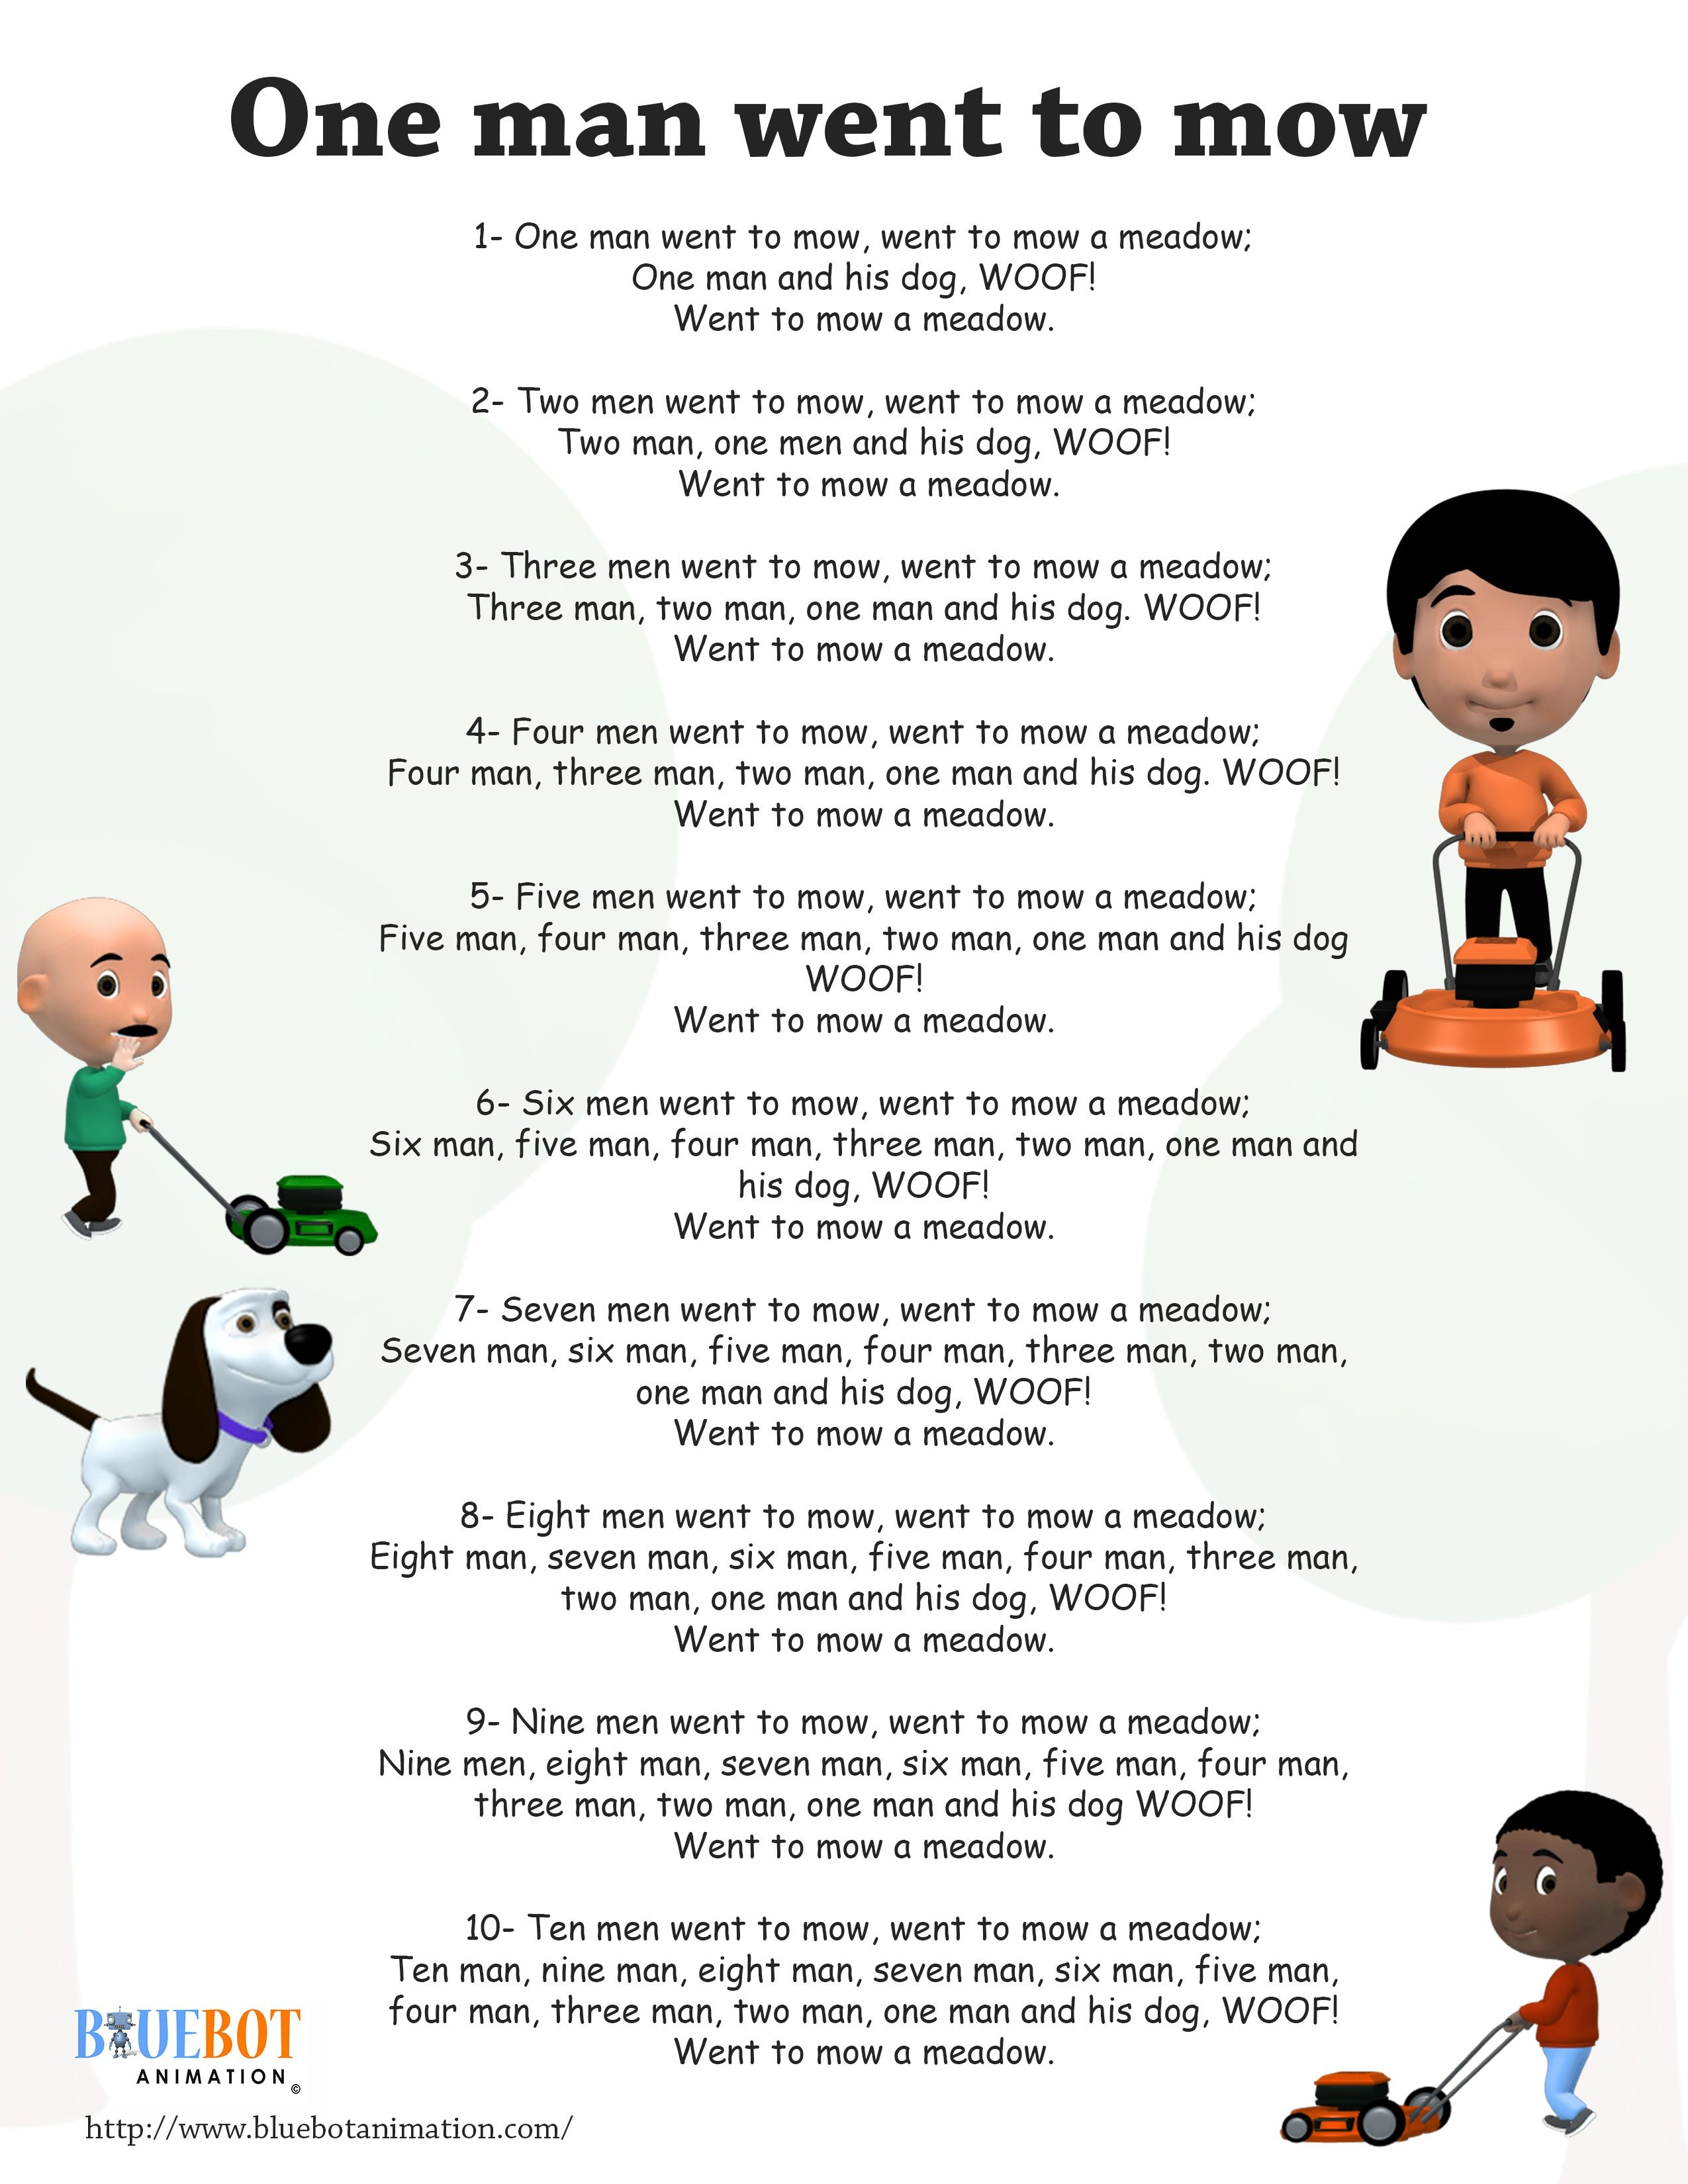 10 Men Went To Mow Nursery Rhyme Lyrics Free Printable Nursery Rhyme - Free Printable Nursery Rhymes Songs